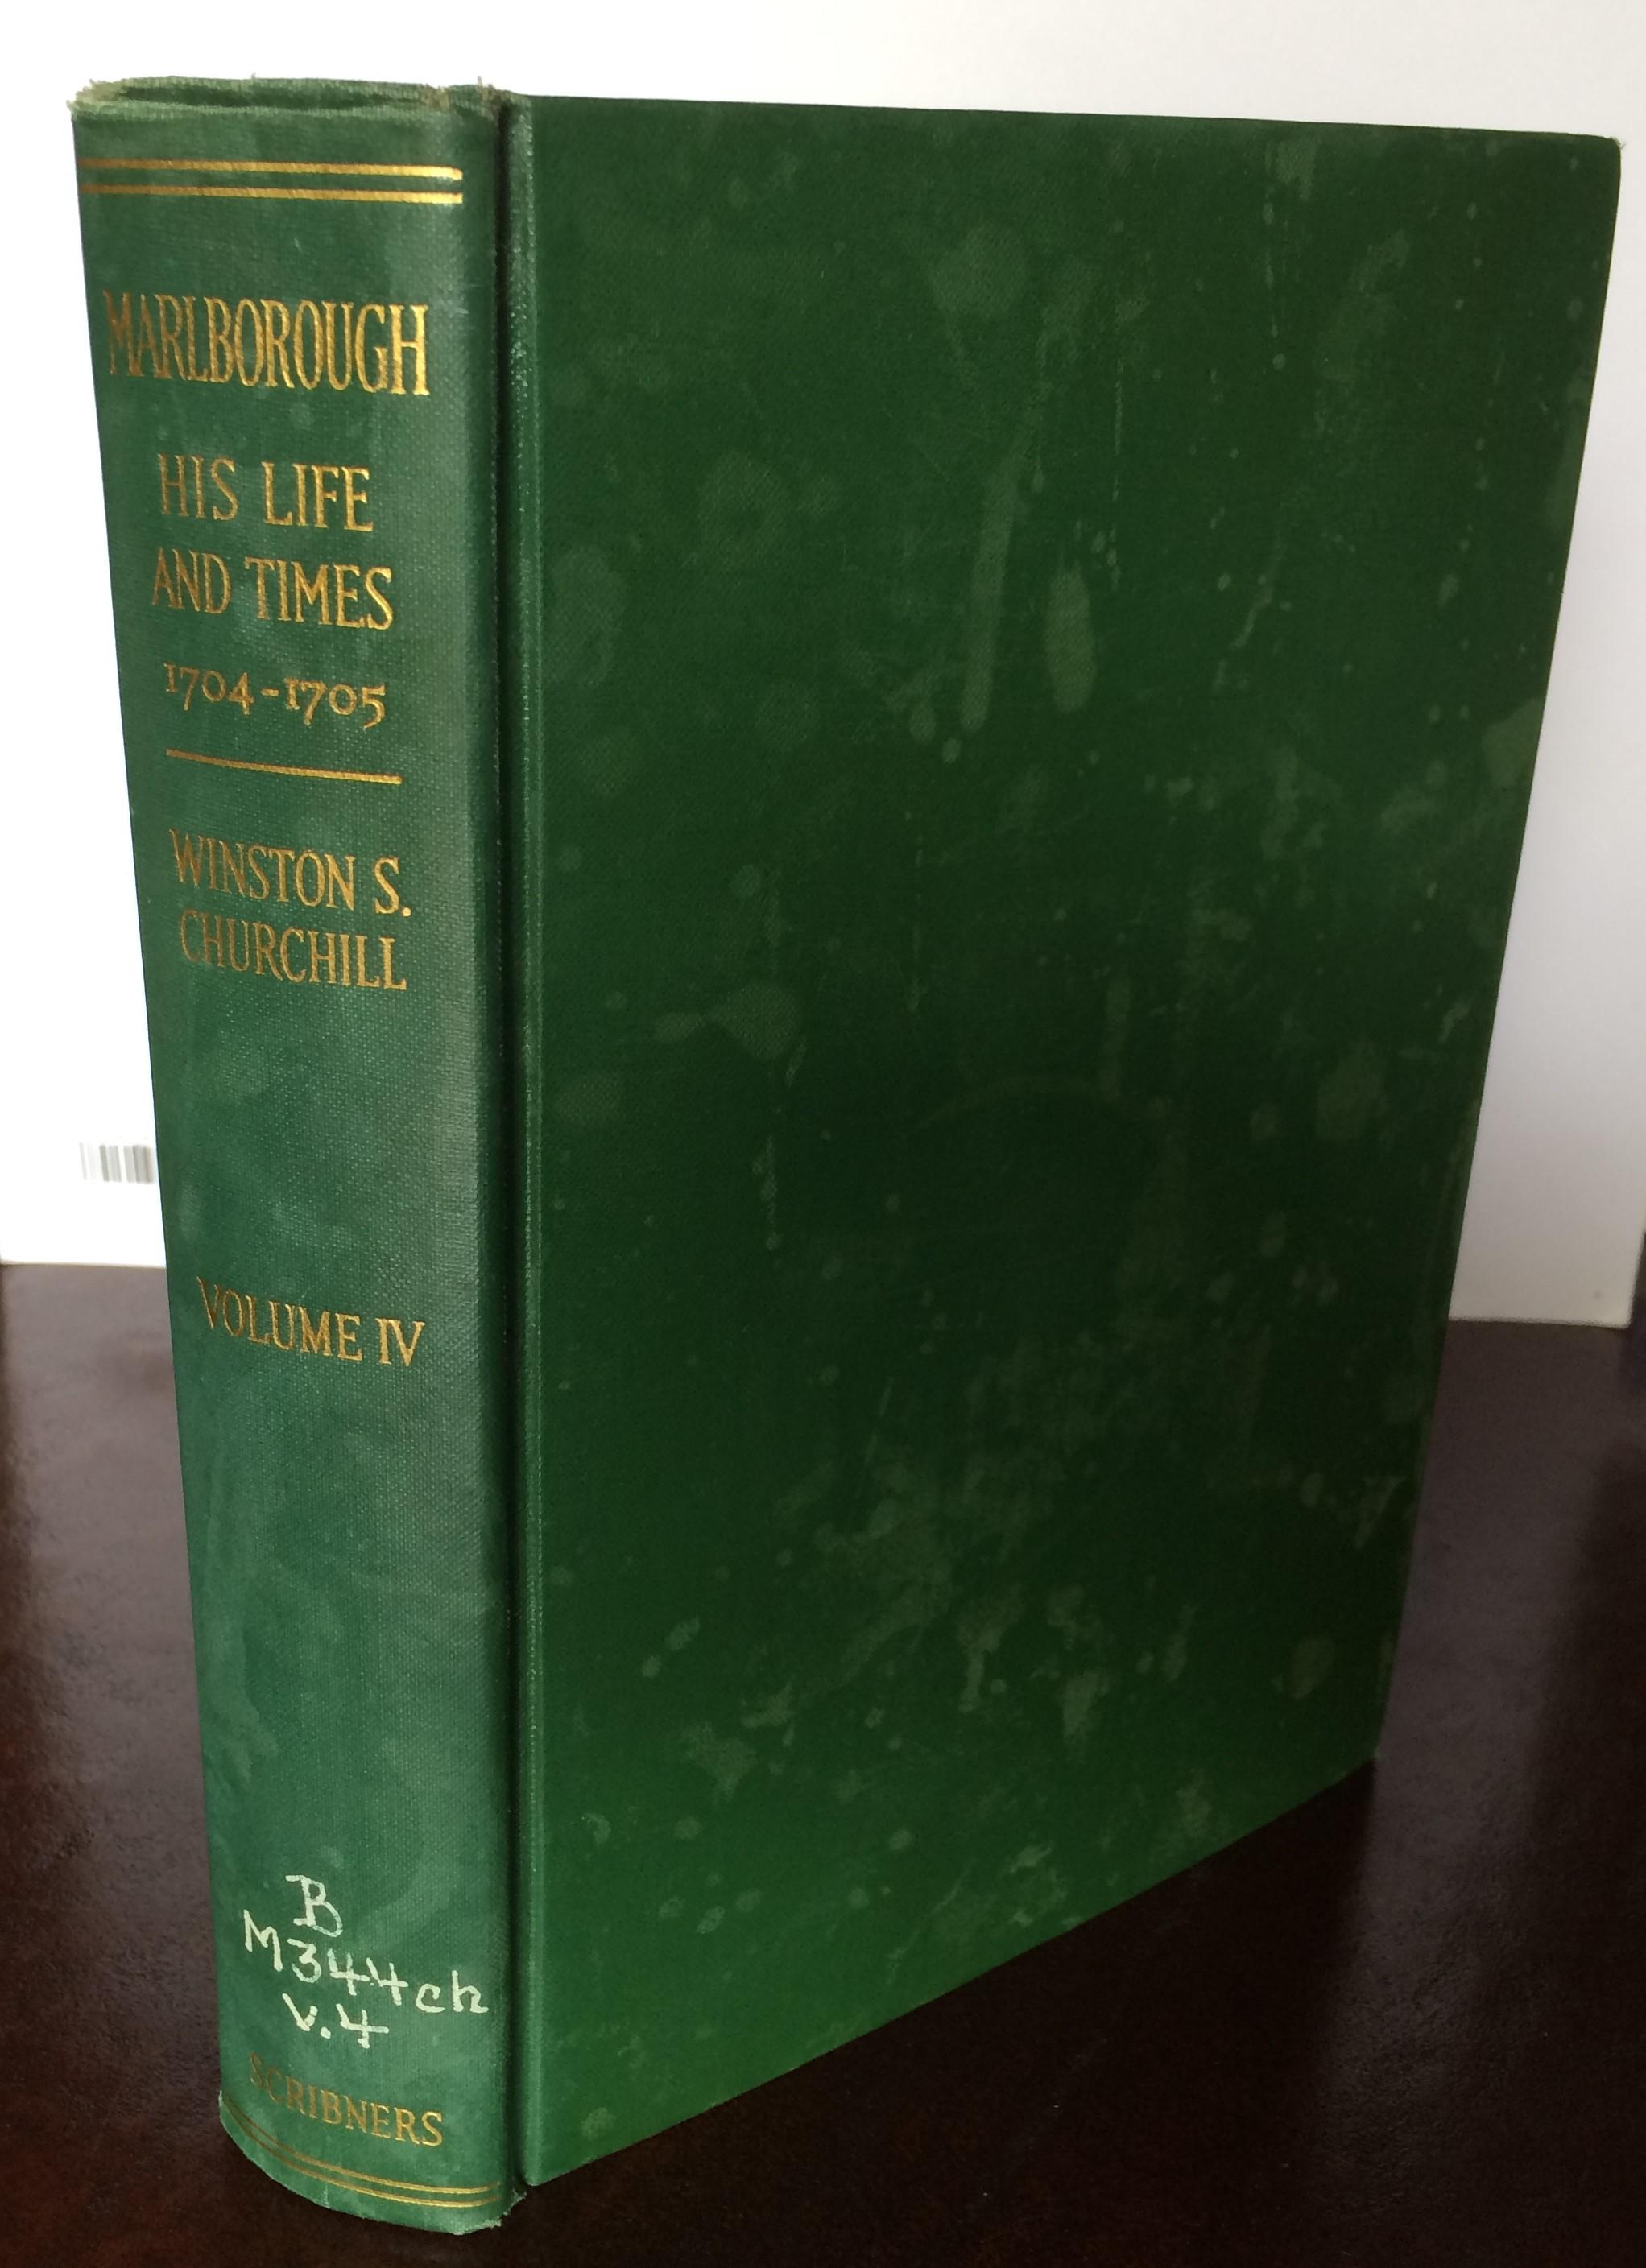 Marlborough: His Life and Times, Volume IV 1704-1705